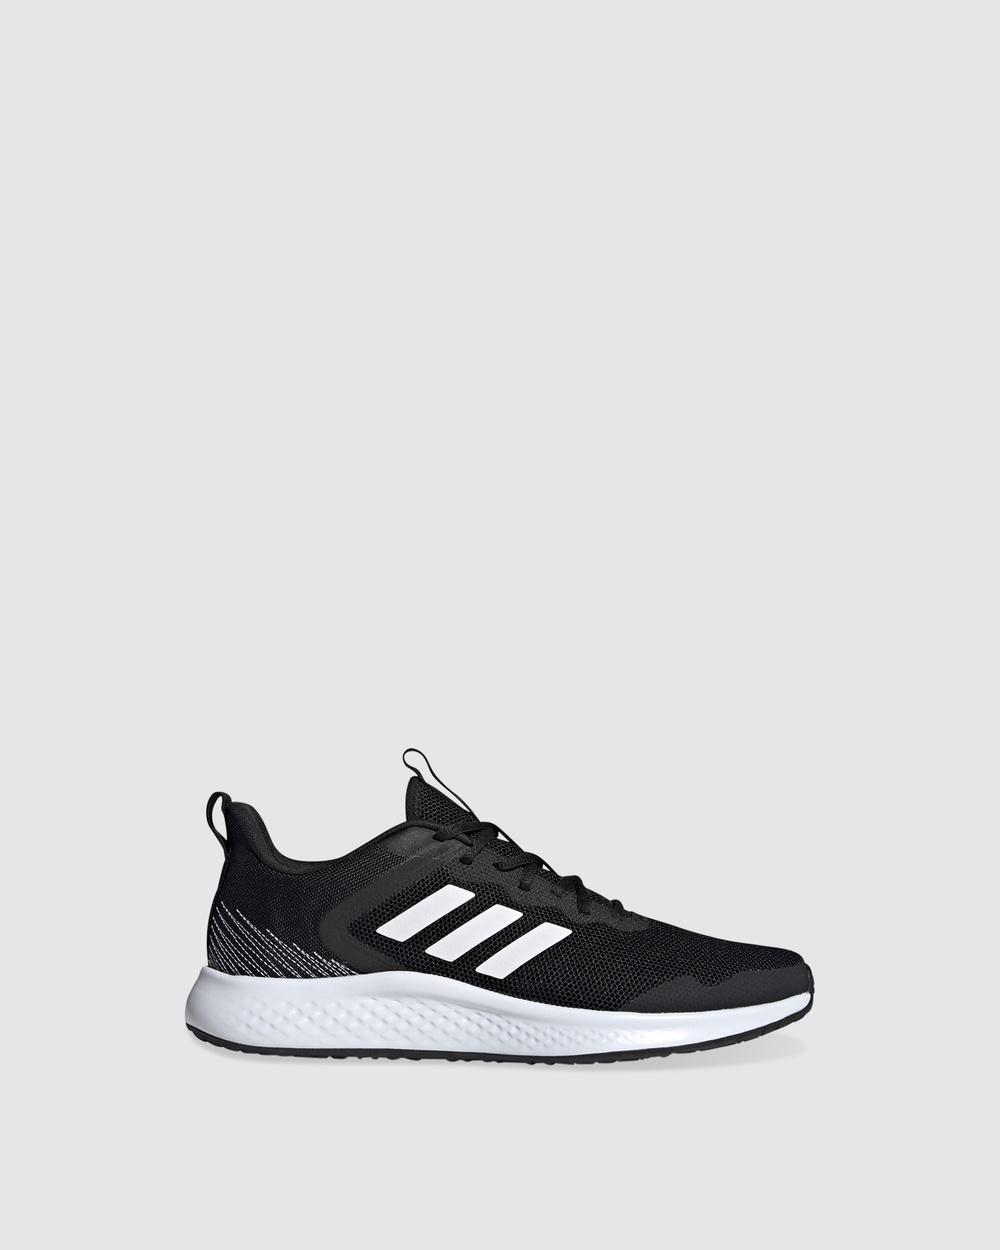 adidas Performance Fluidstreet Shoes Black